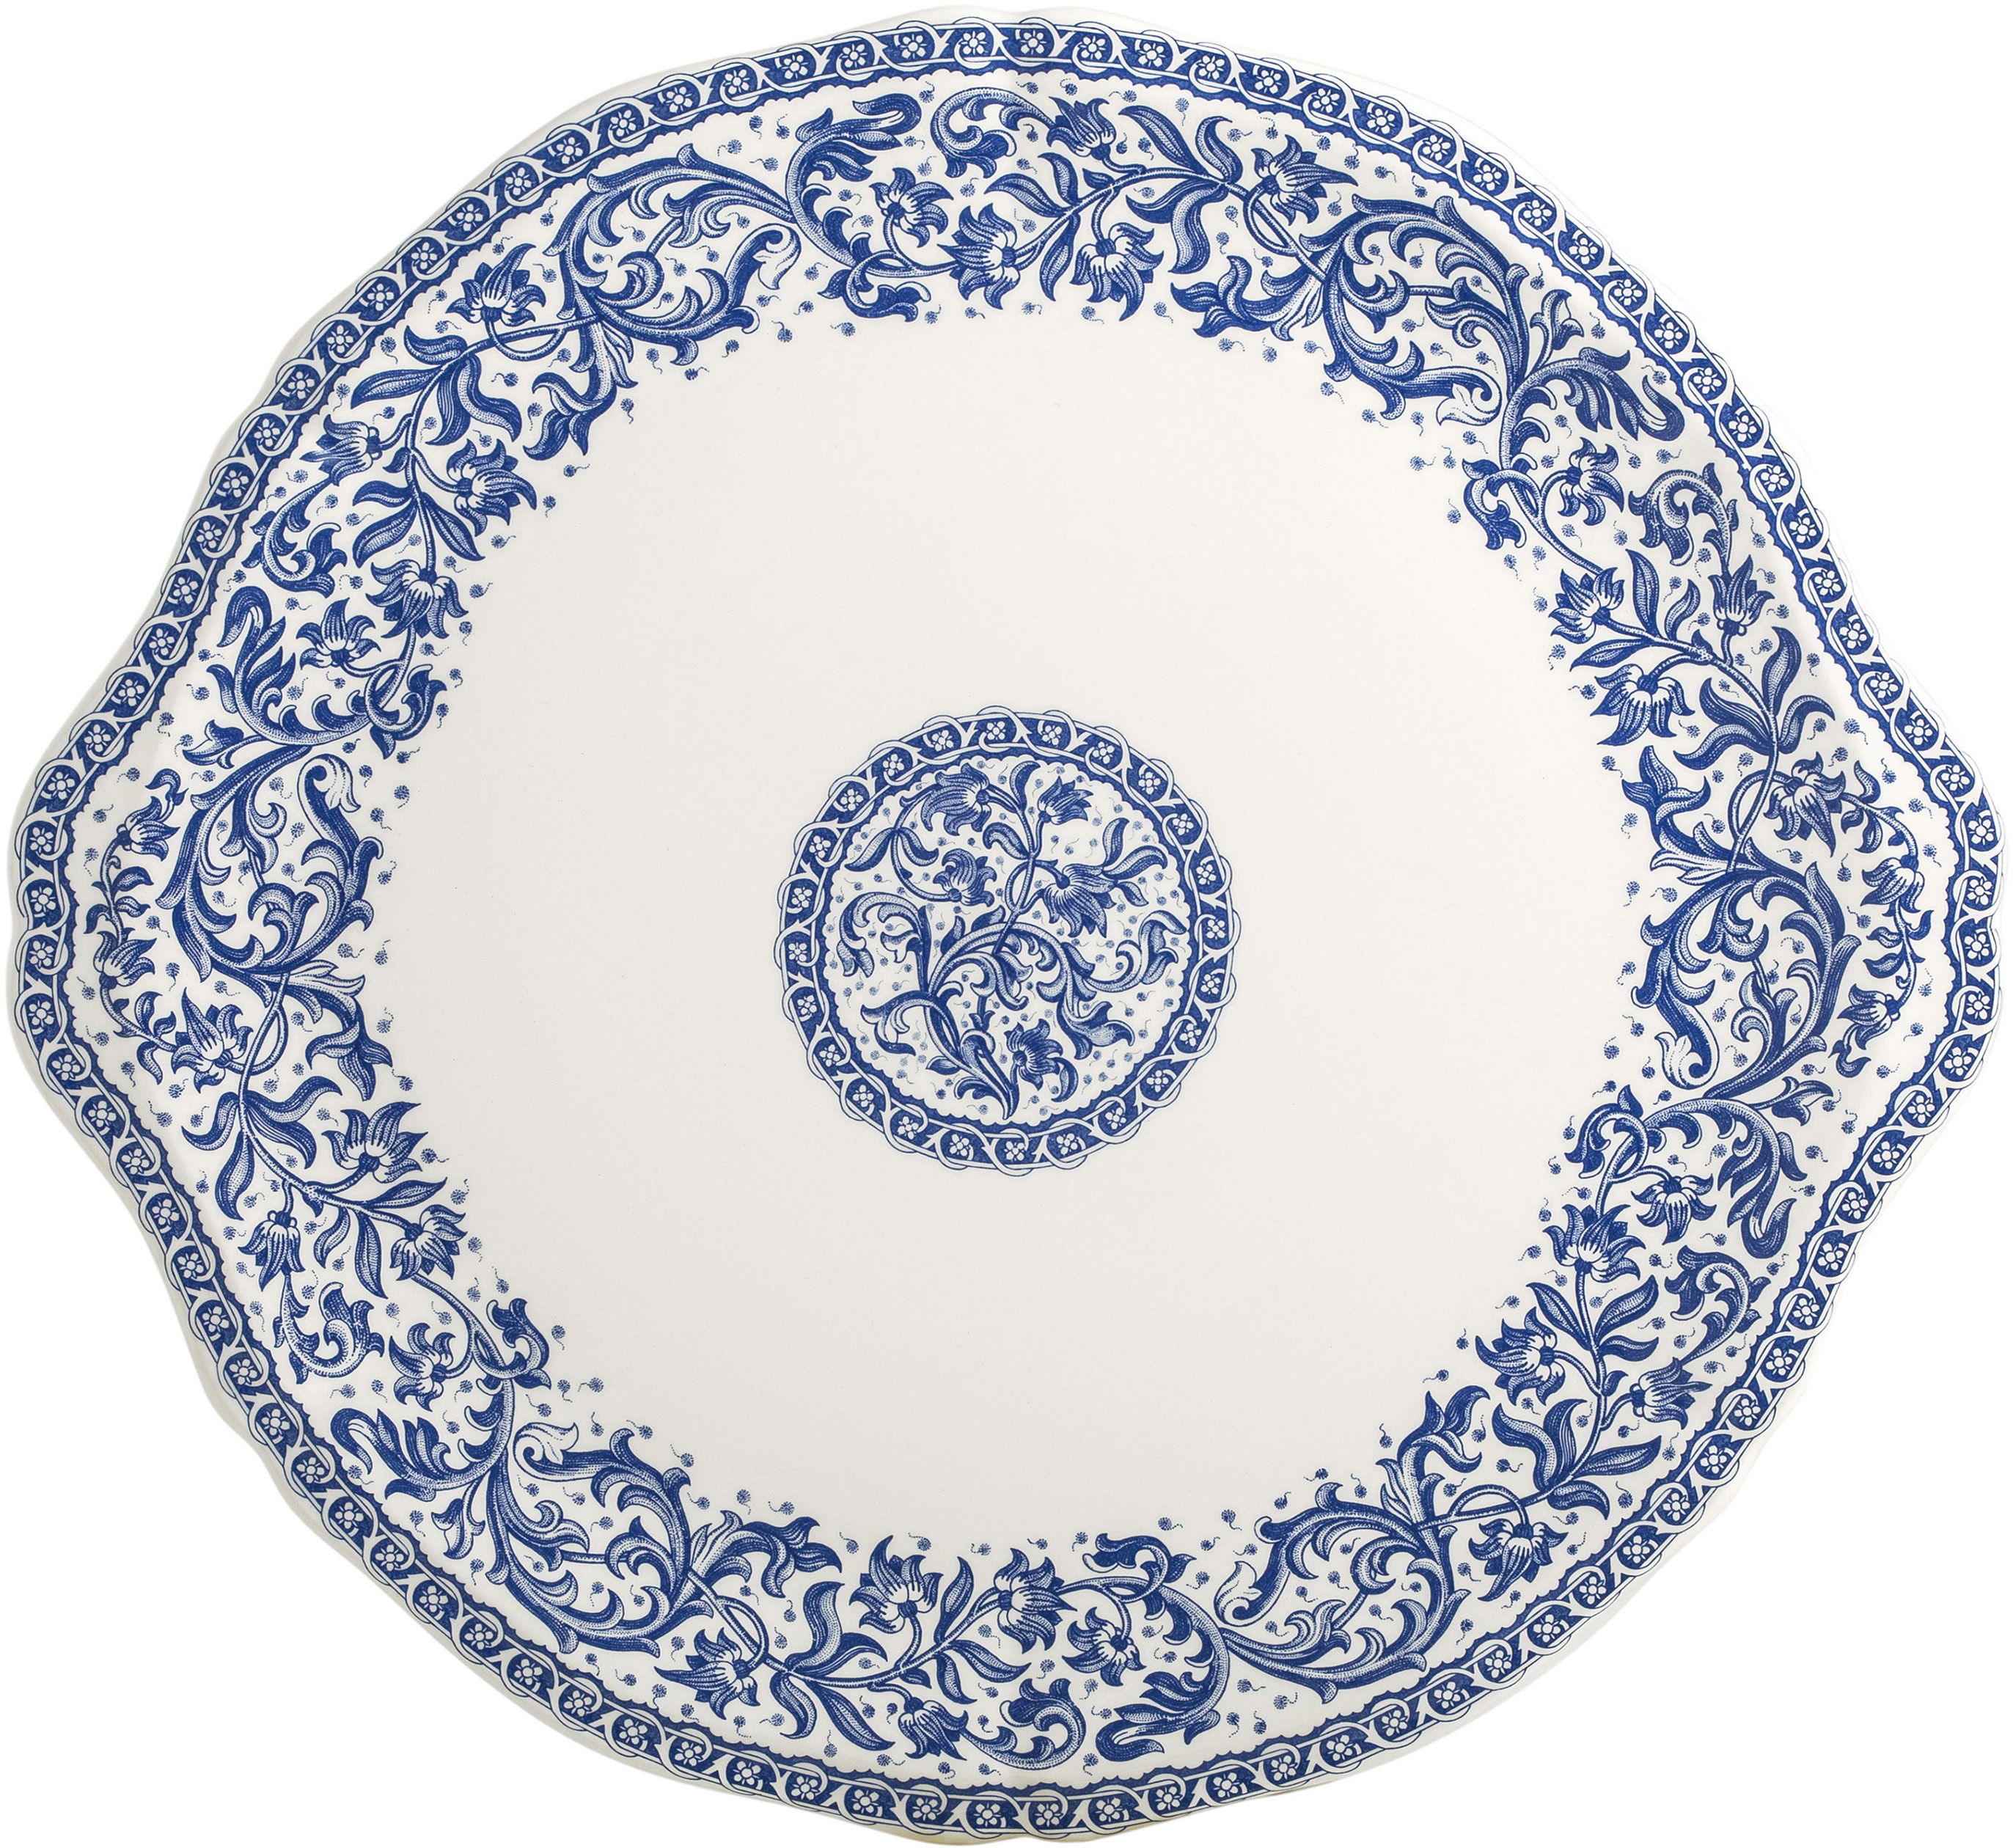 Rouen 37 Cake Platter 13 1/4 In Dia   Gracious Style  sc 1 st  Gracious Style & Gien France Rouen Dinnerware   Gracious Style